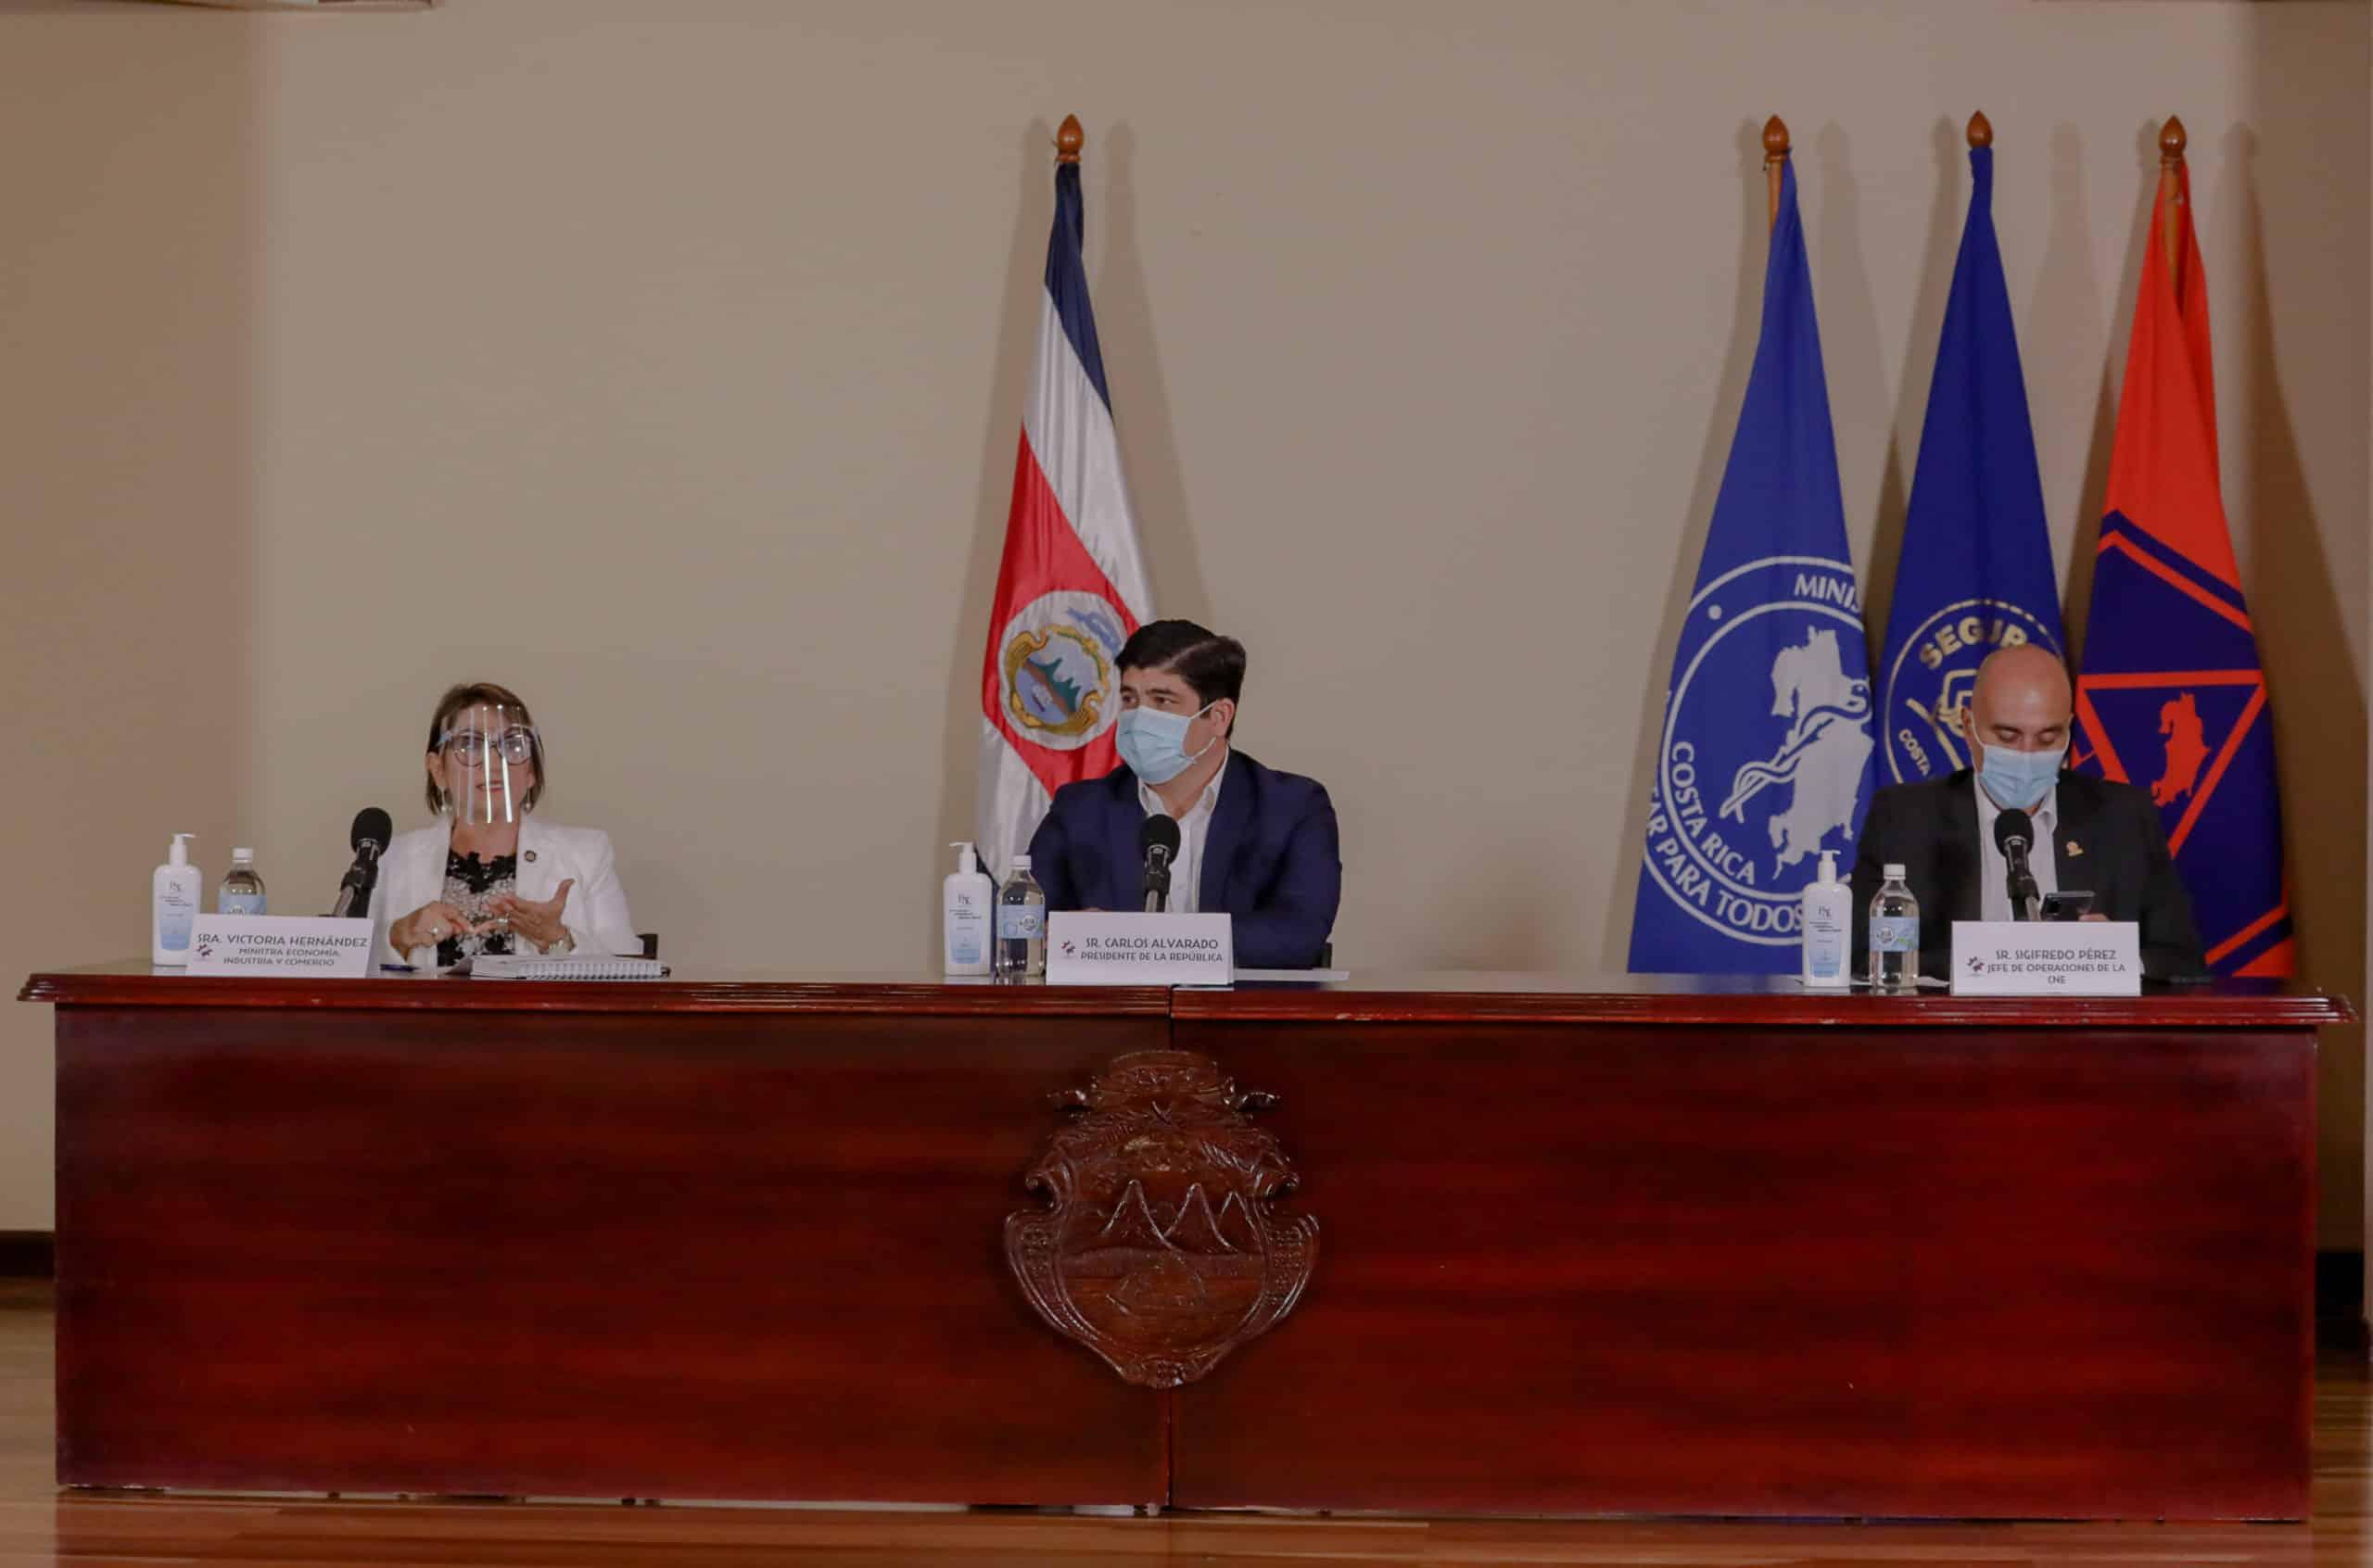 Victoria Hernández, President Carlos Alvarado and Sigifredo Pérez speak at the coronavirus press conference on August 26, 2020.